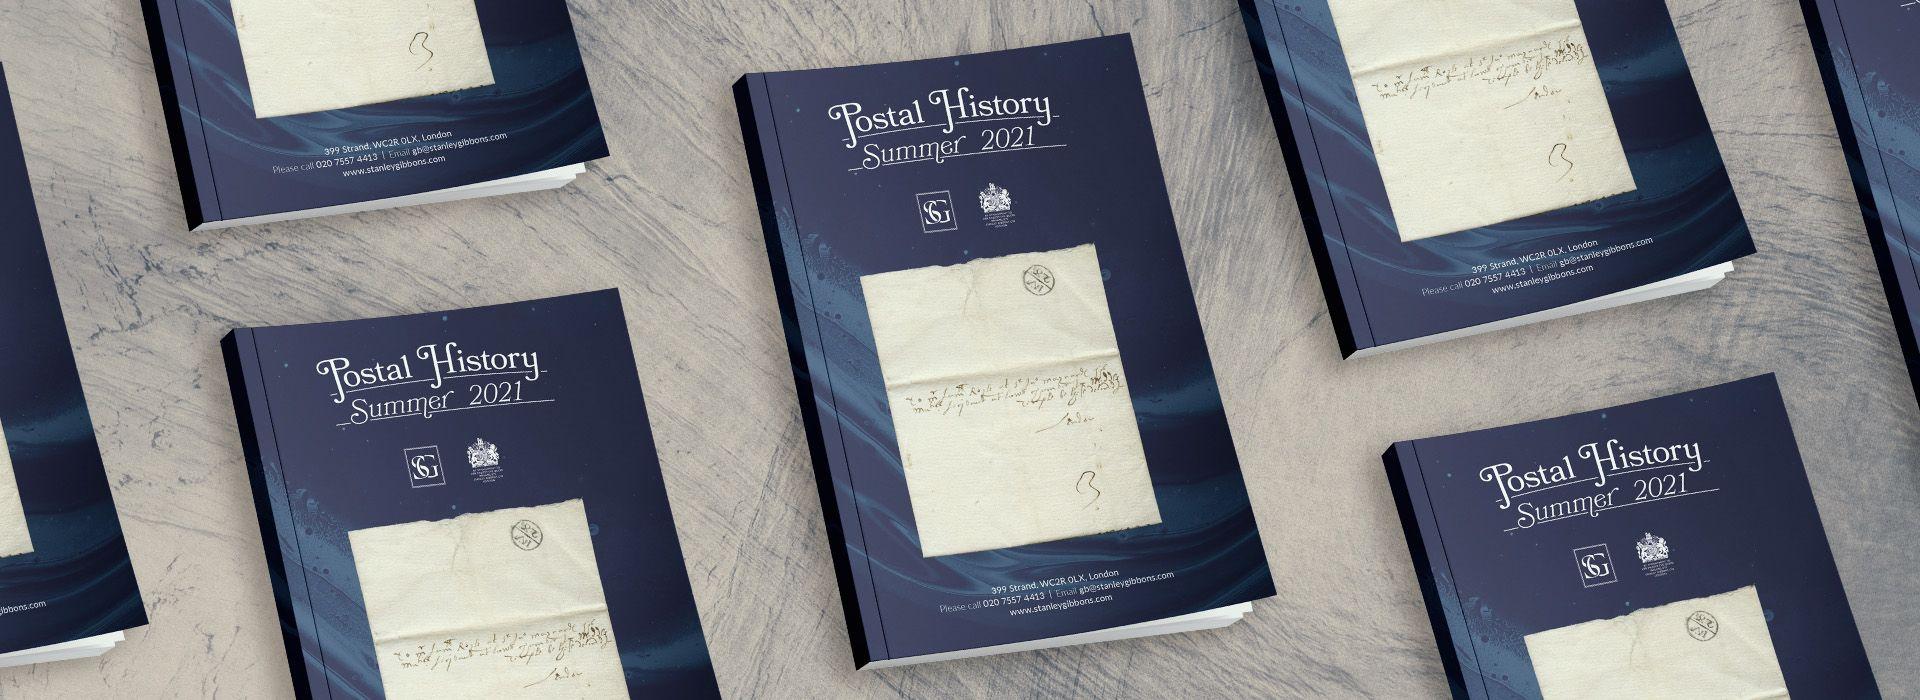 GB Postal History 21